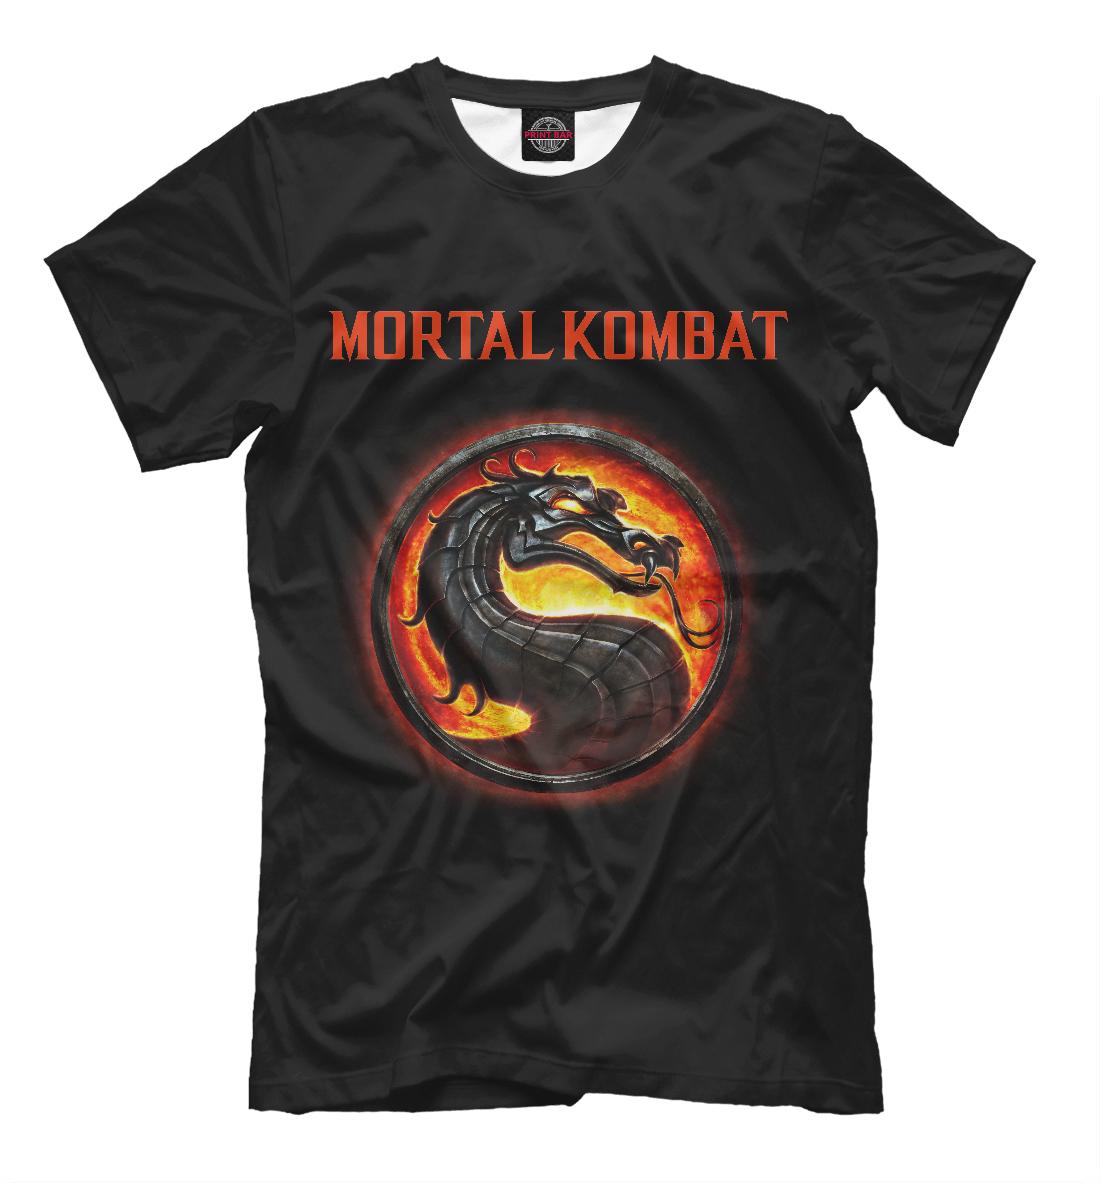 Купить Mortal Kombat, Printbar, Футболки, MKB-860737-fut-2